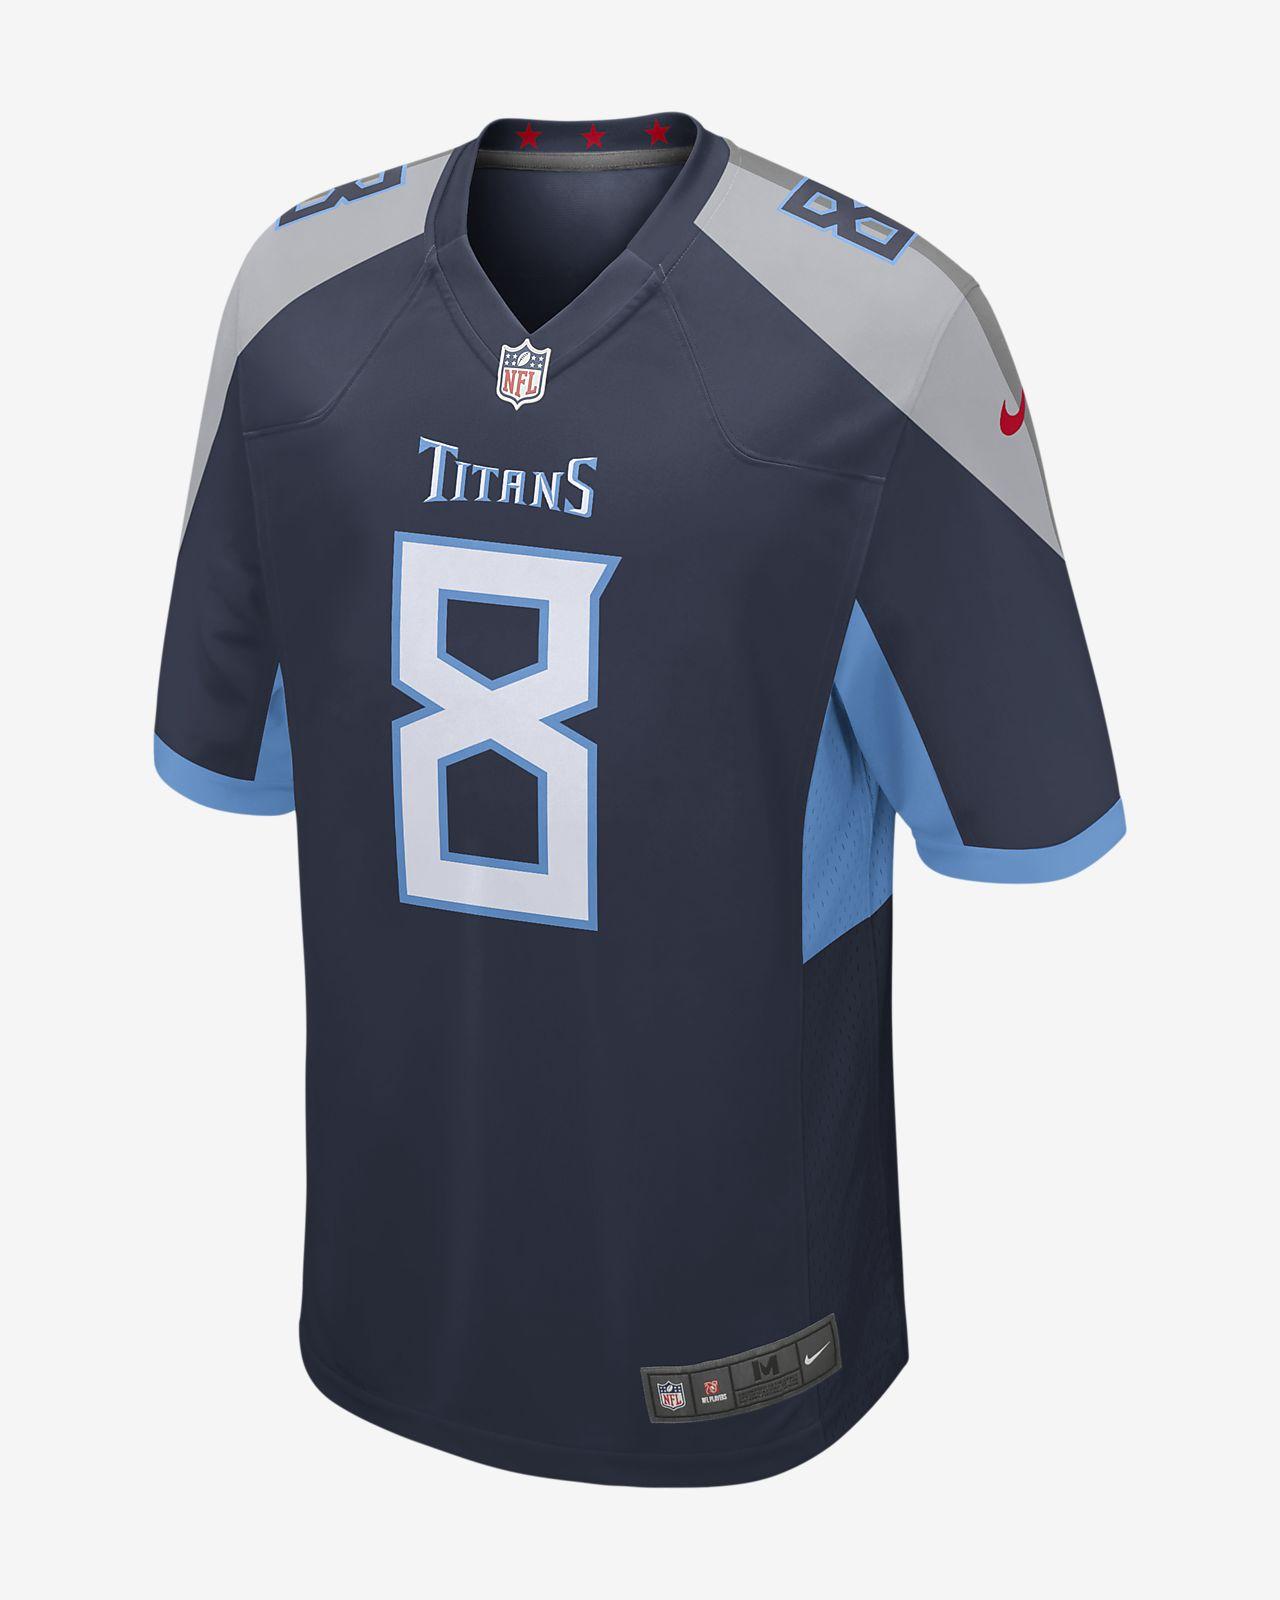 NFL Tennessee Titans (Marcus Mariota) férfi amerikaifutball-mérkőzésmez